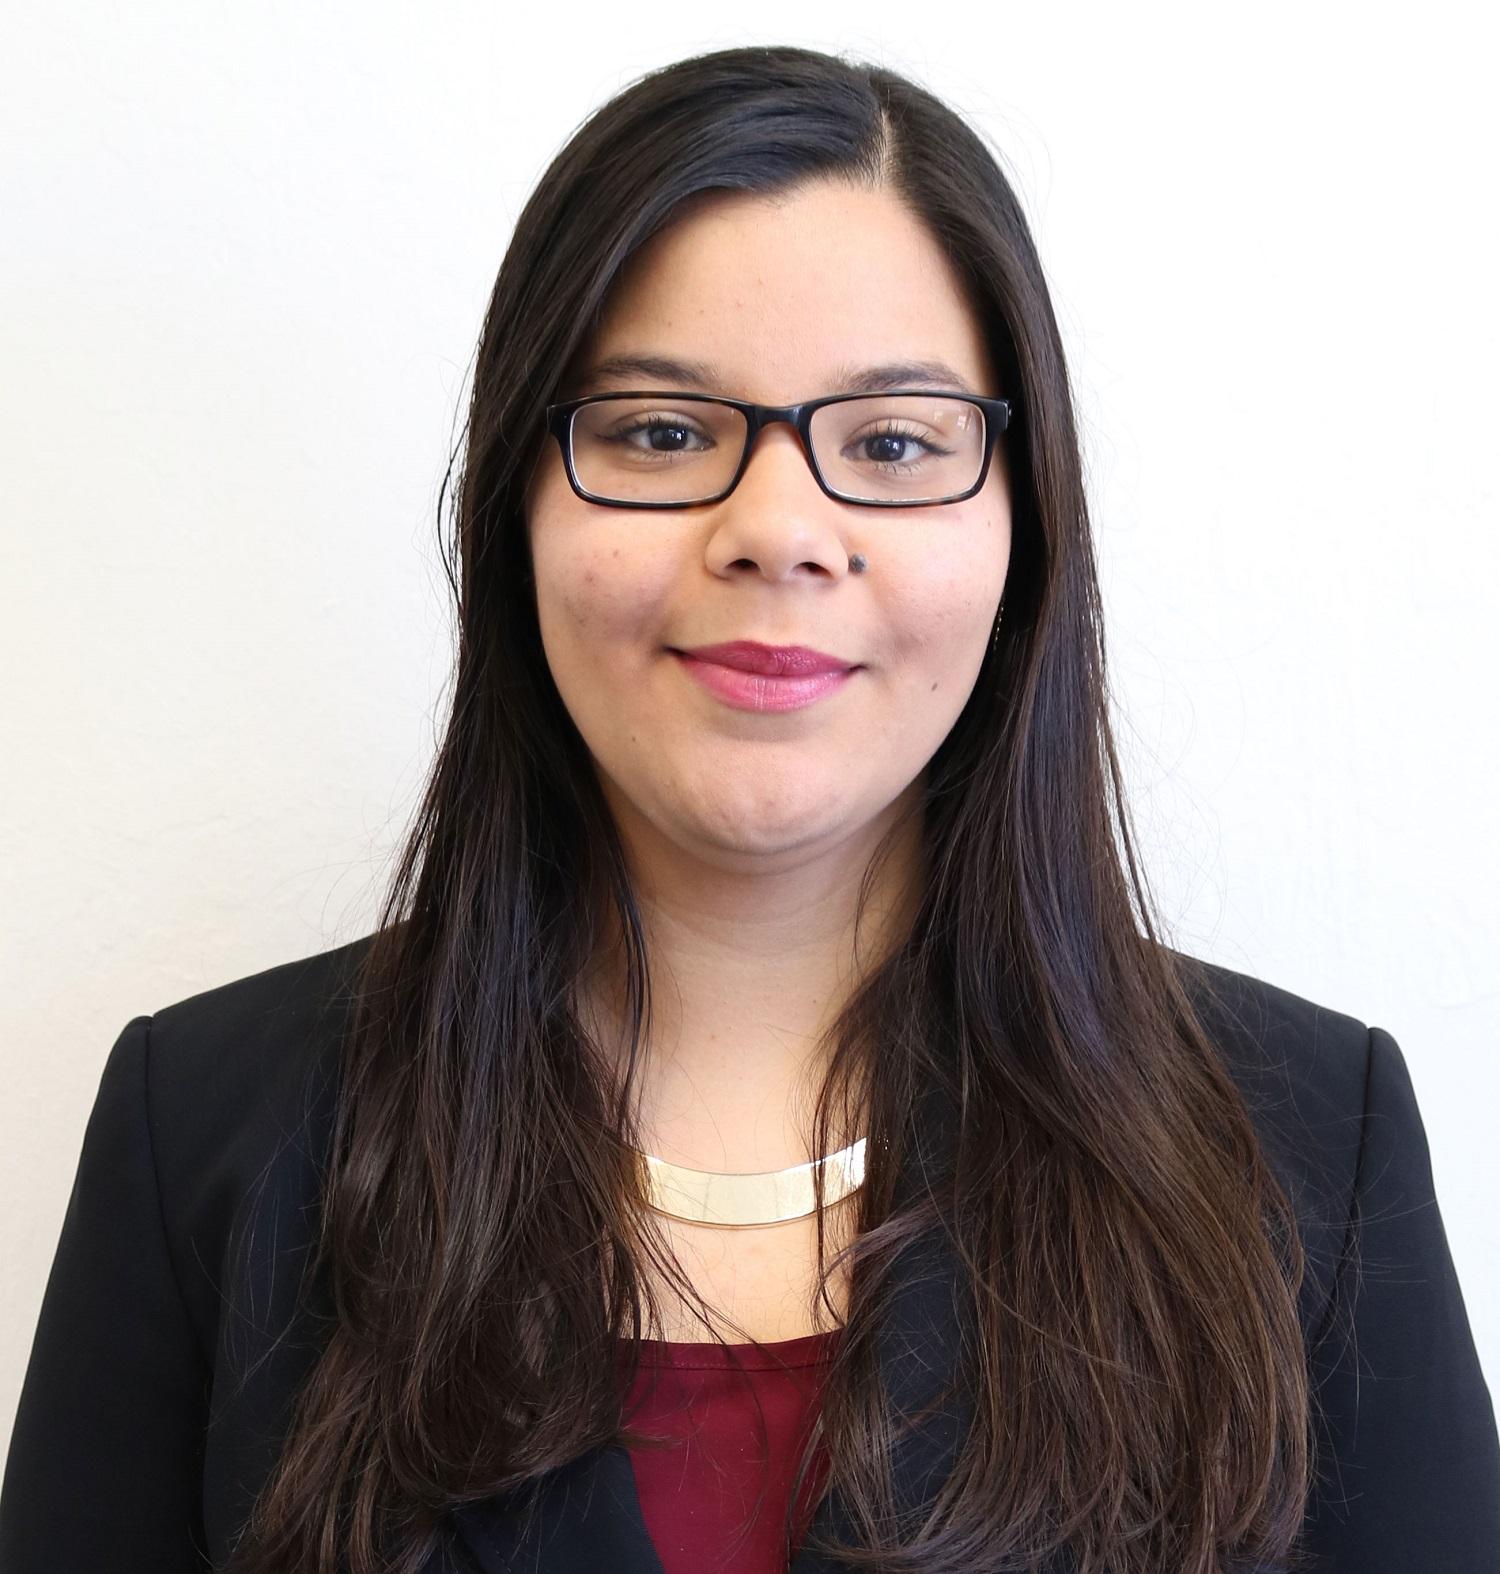 Wendy Villalobos, Bay Area Hispano Institute for Advancement - Berkeley